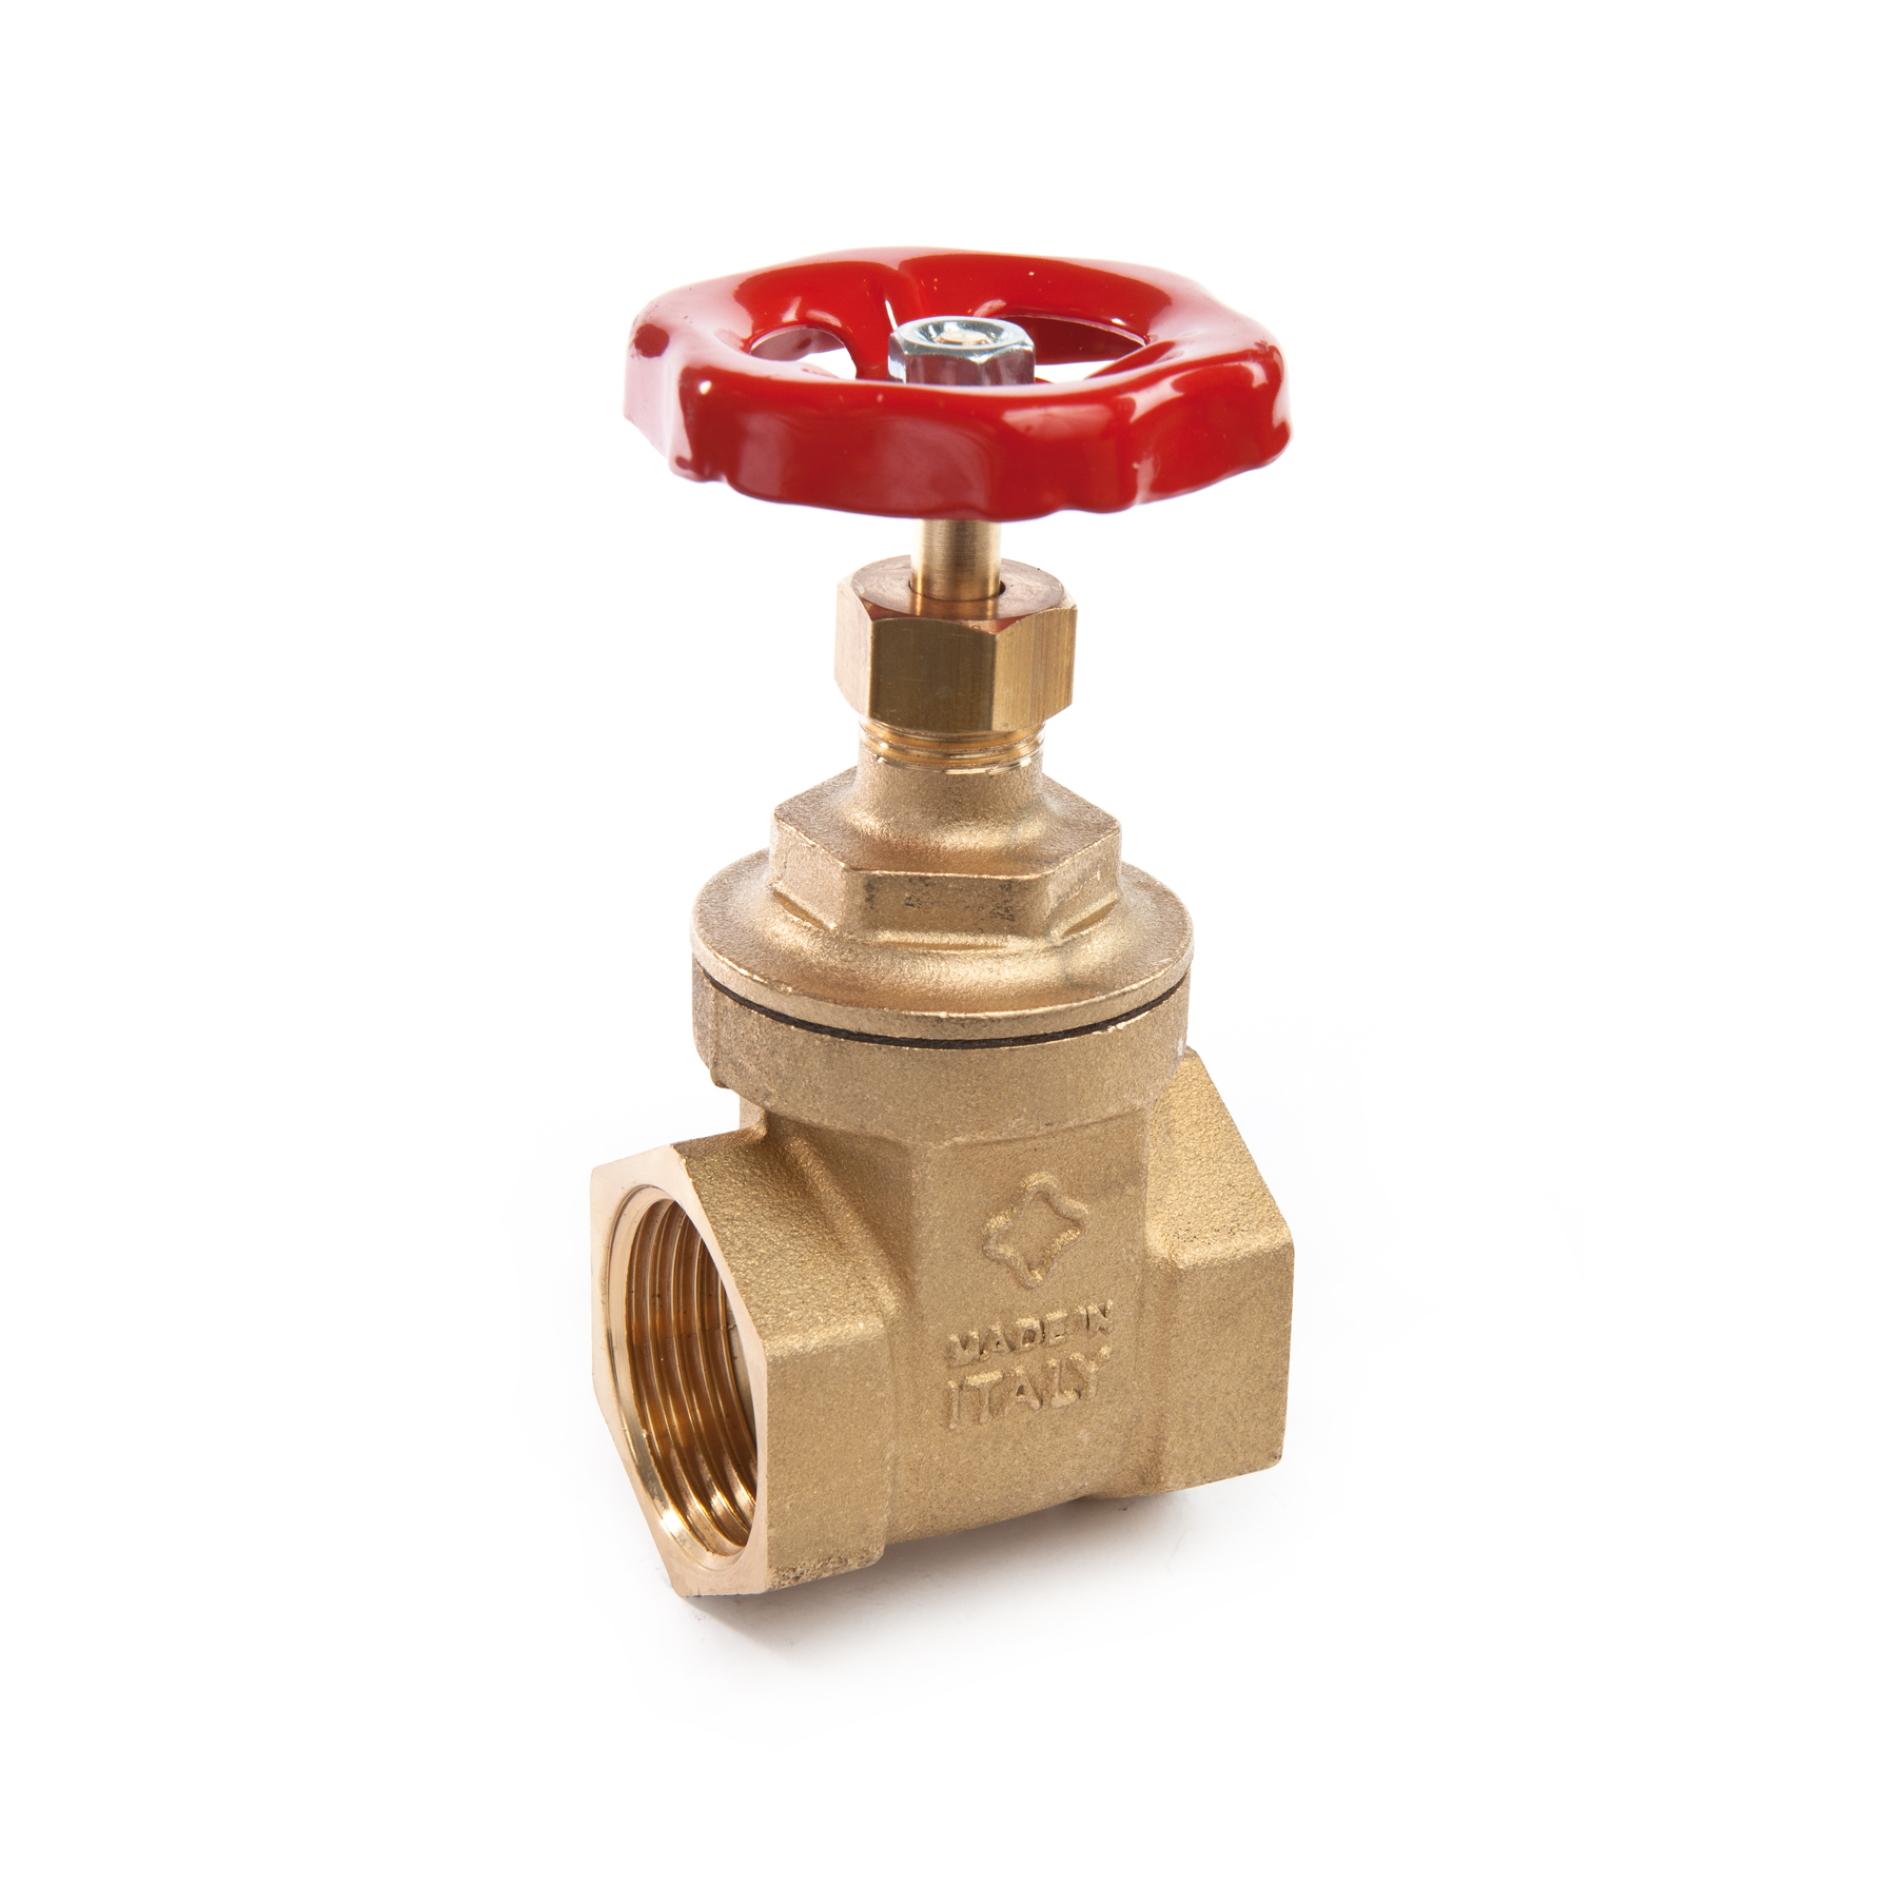 205 Saracinesca ottone tipo pesante Brass gate valve heavy type FxF PN20